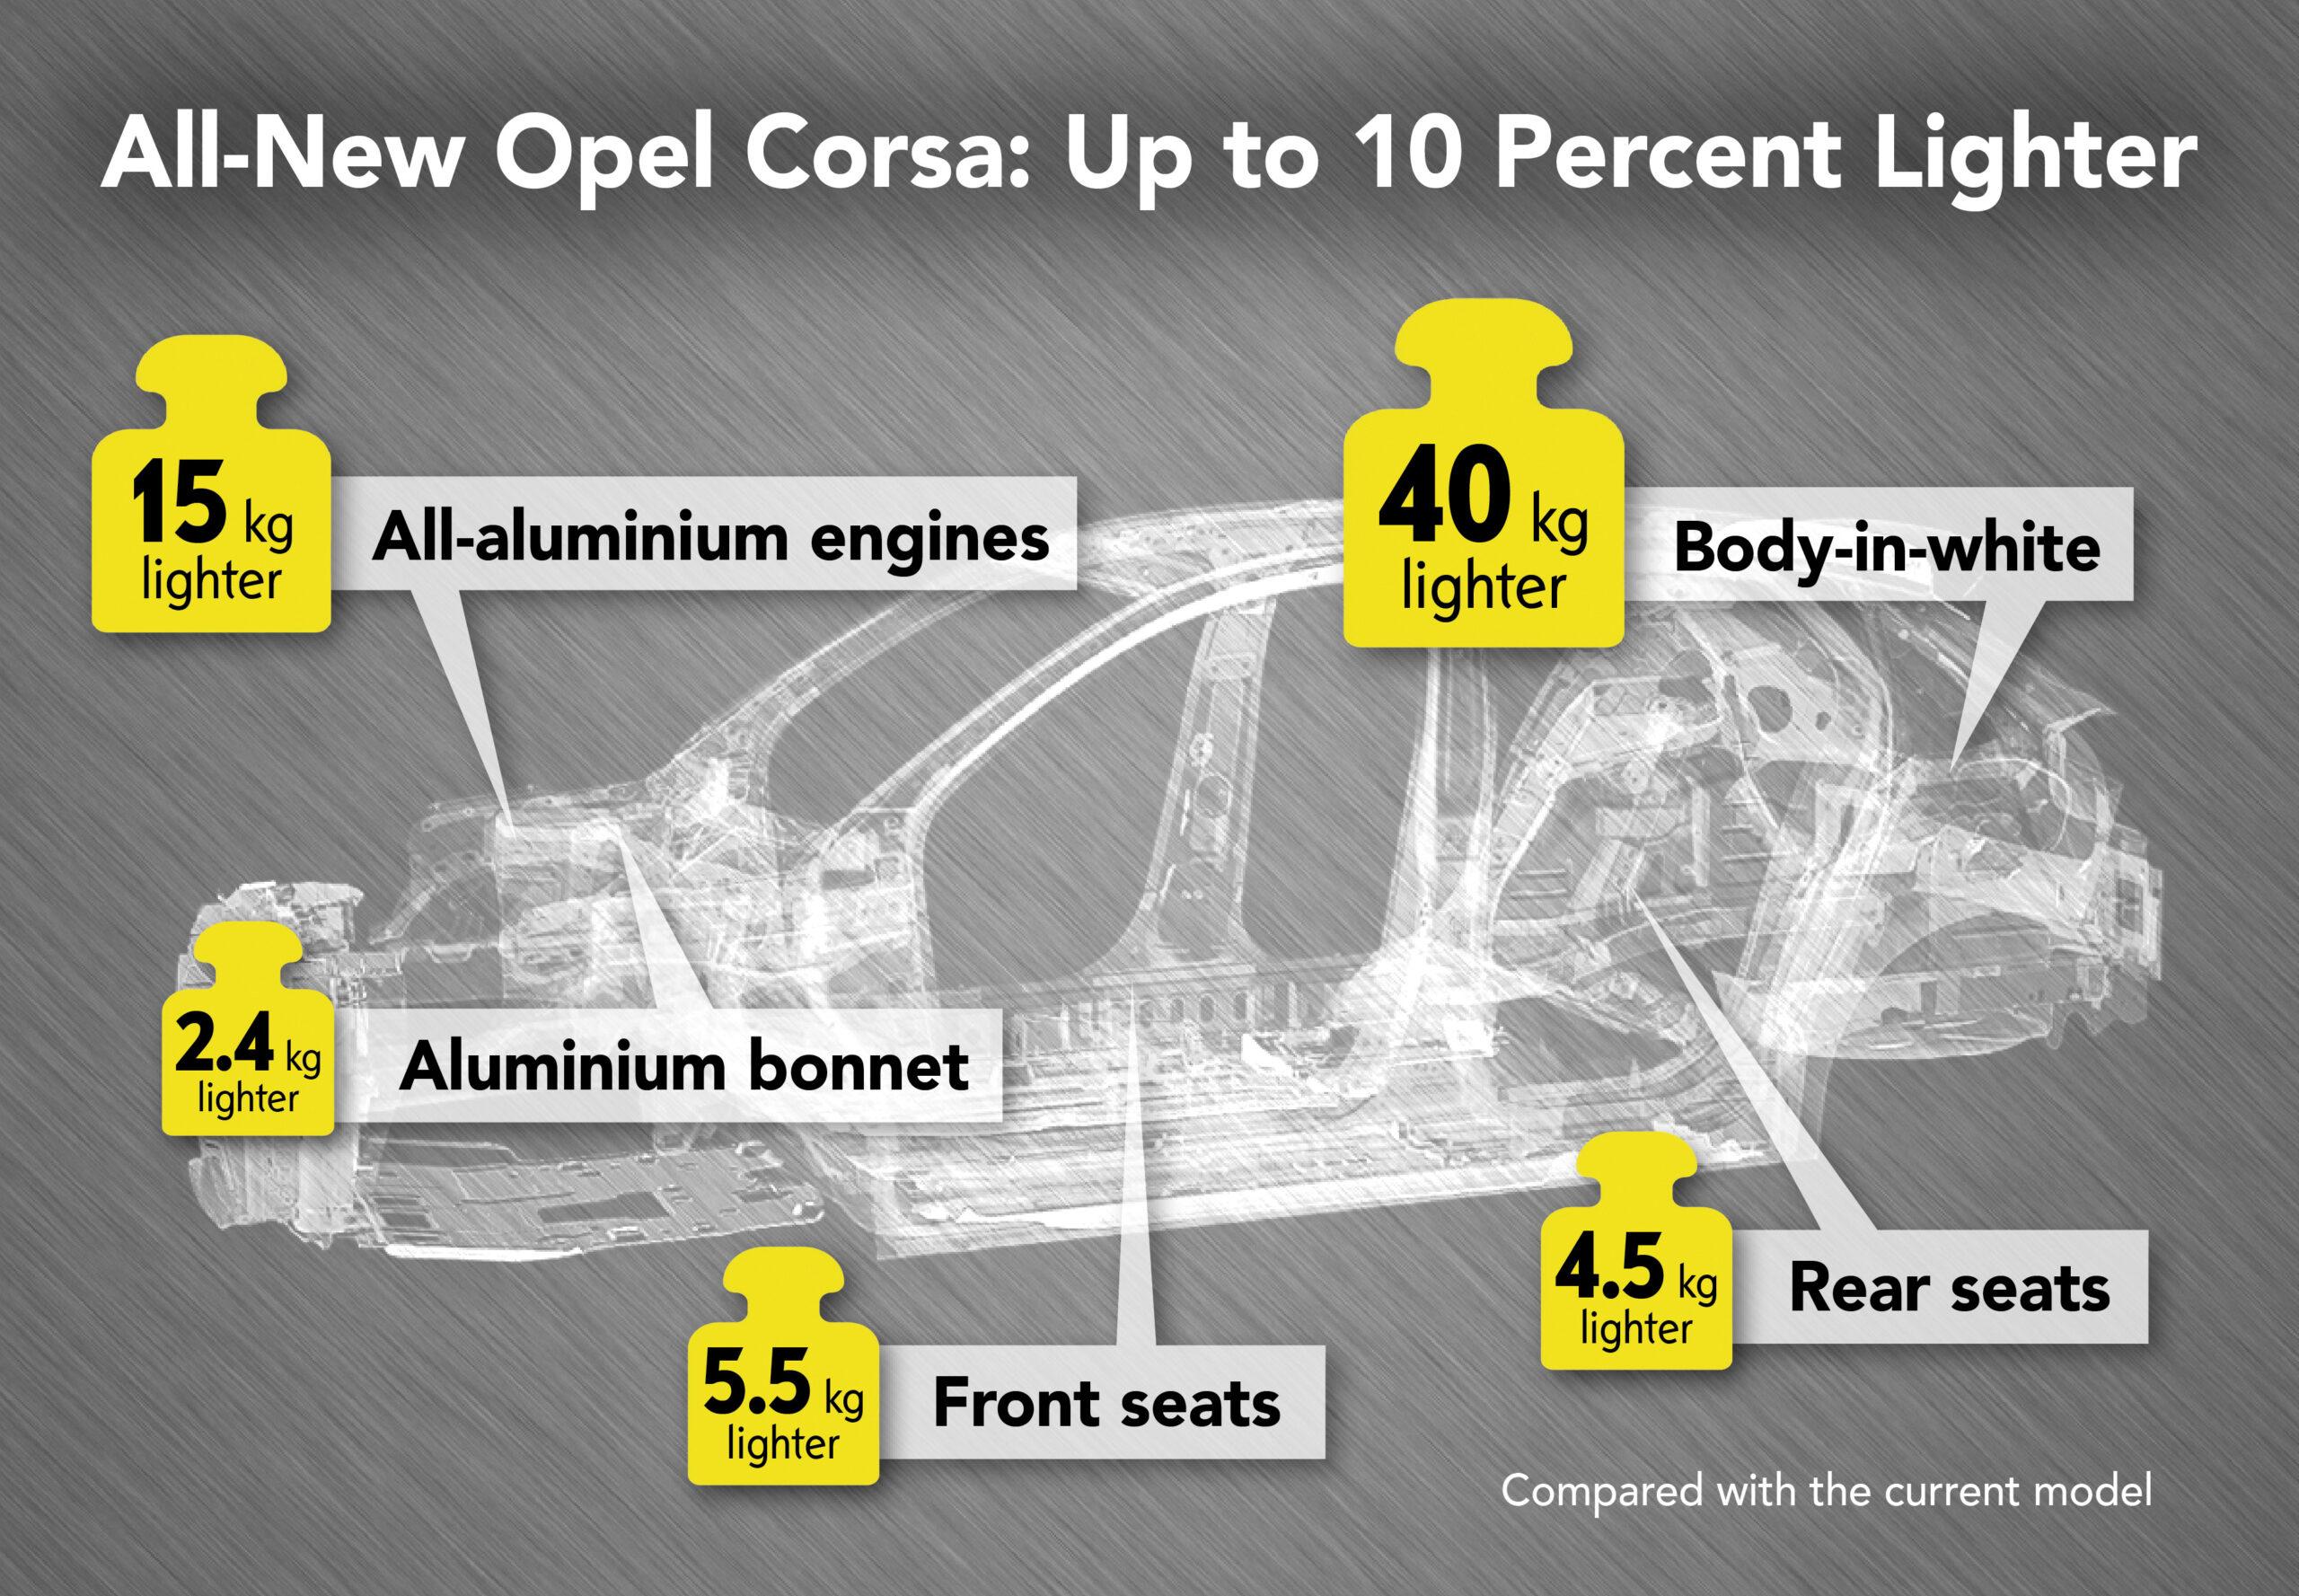 Opel Corsa peso